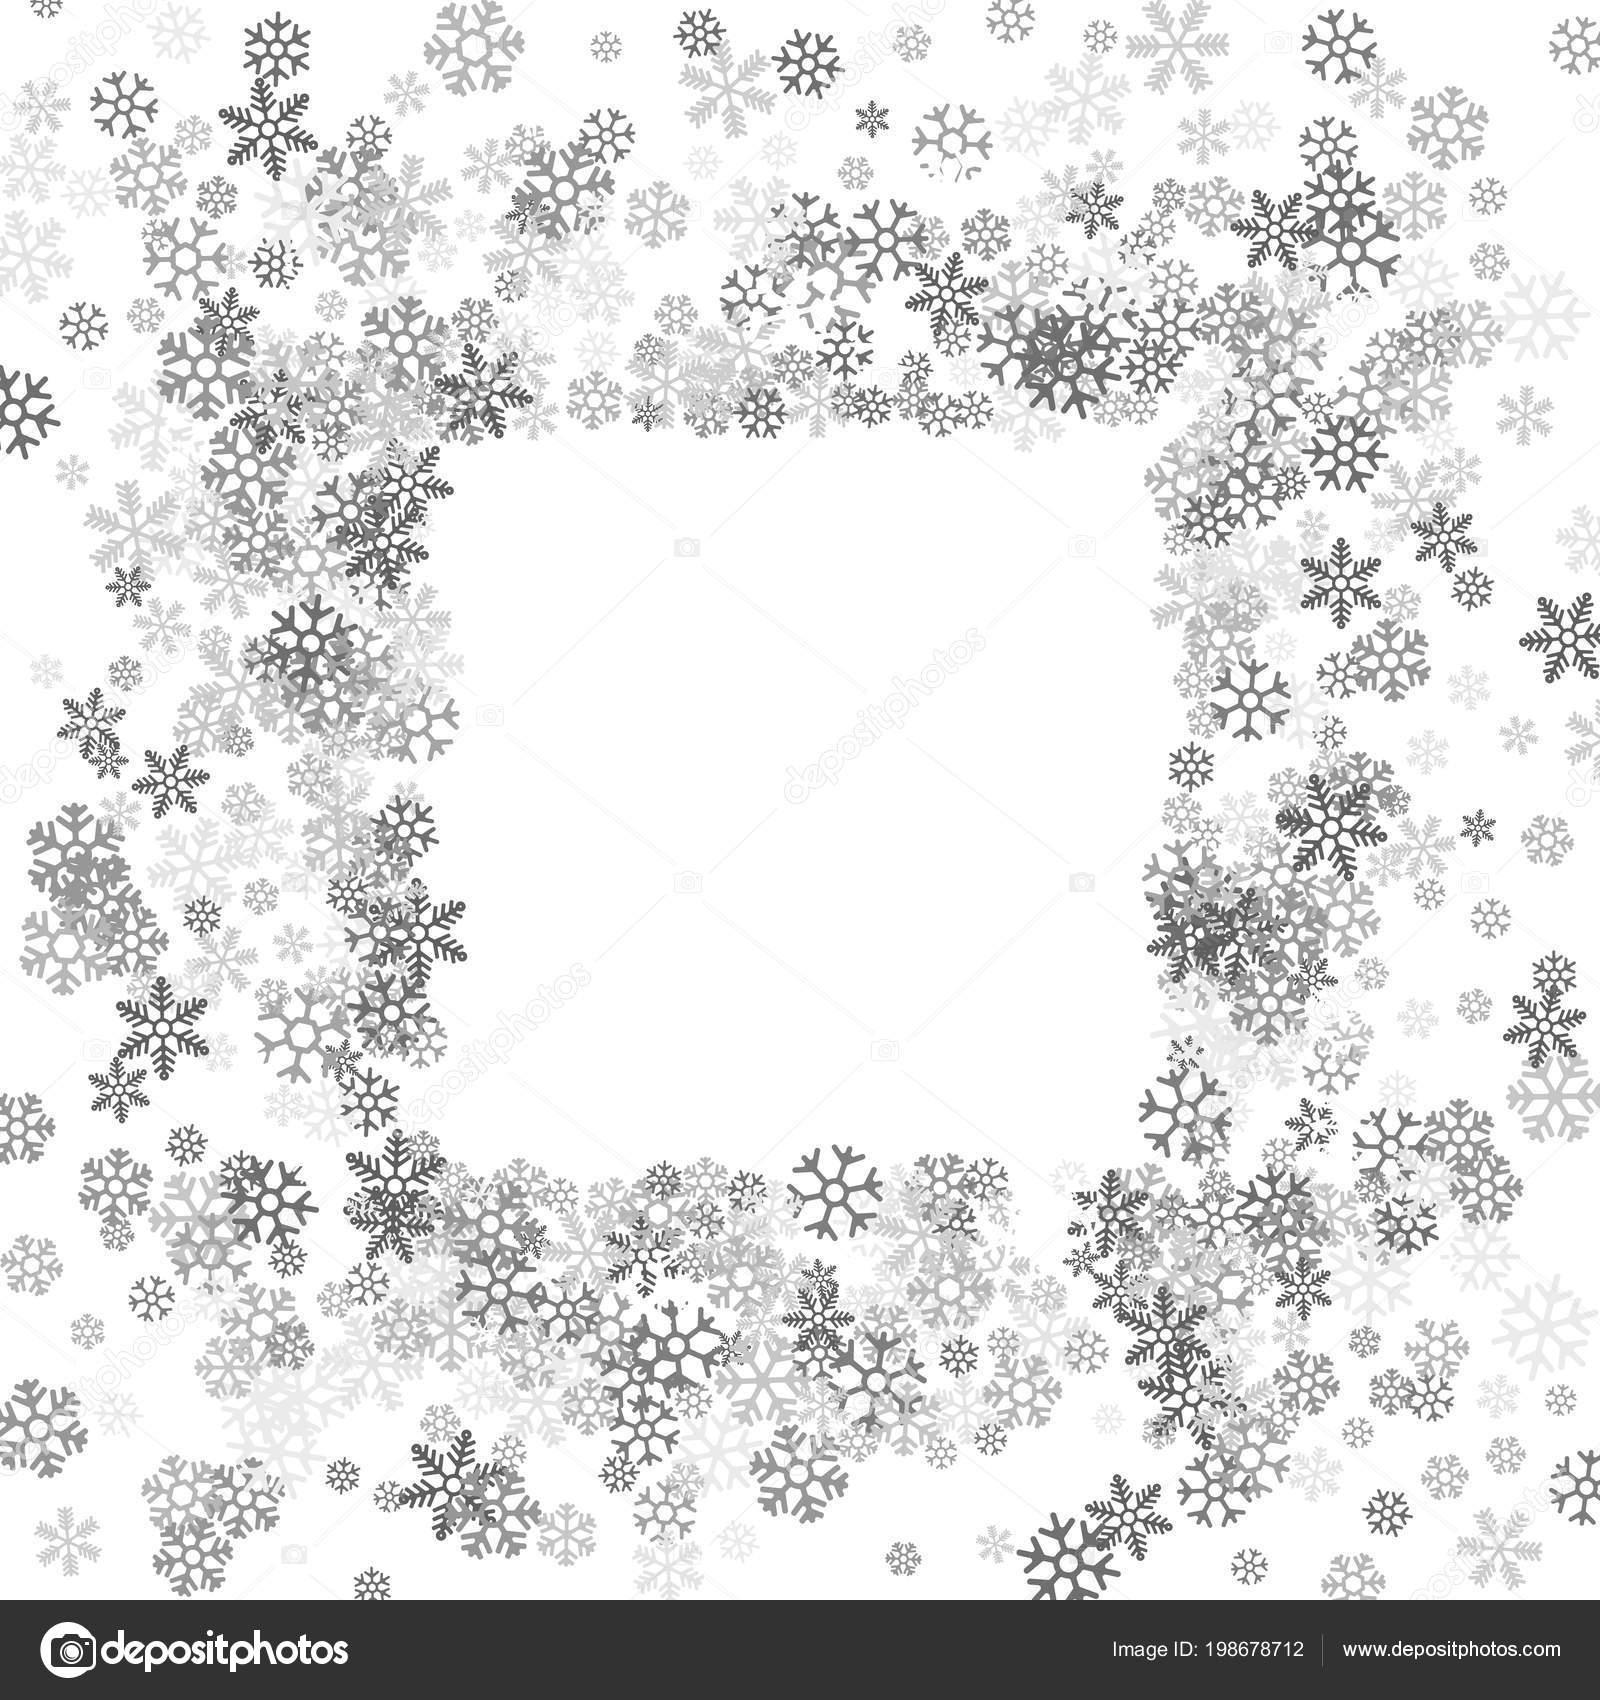 5954389be0f Square silver frame or border of scatter platinum snowflakes on white  background. Design element for festive banner